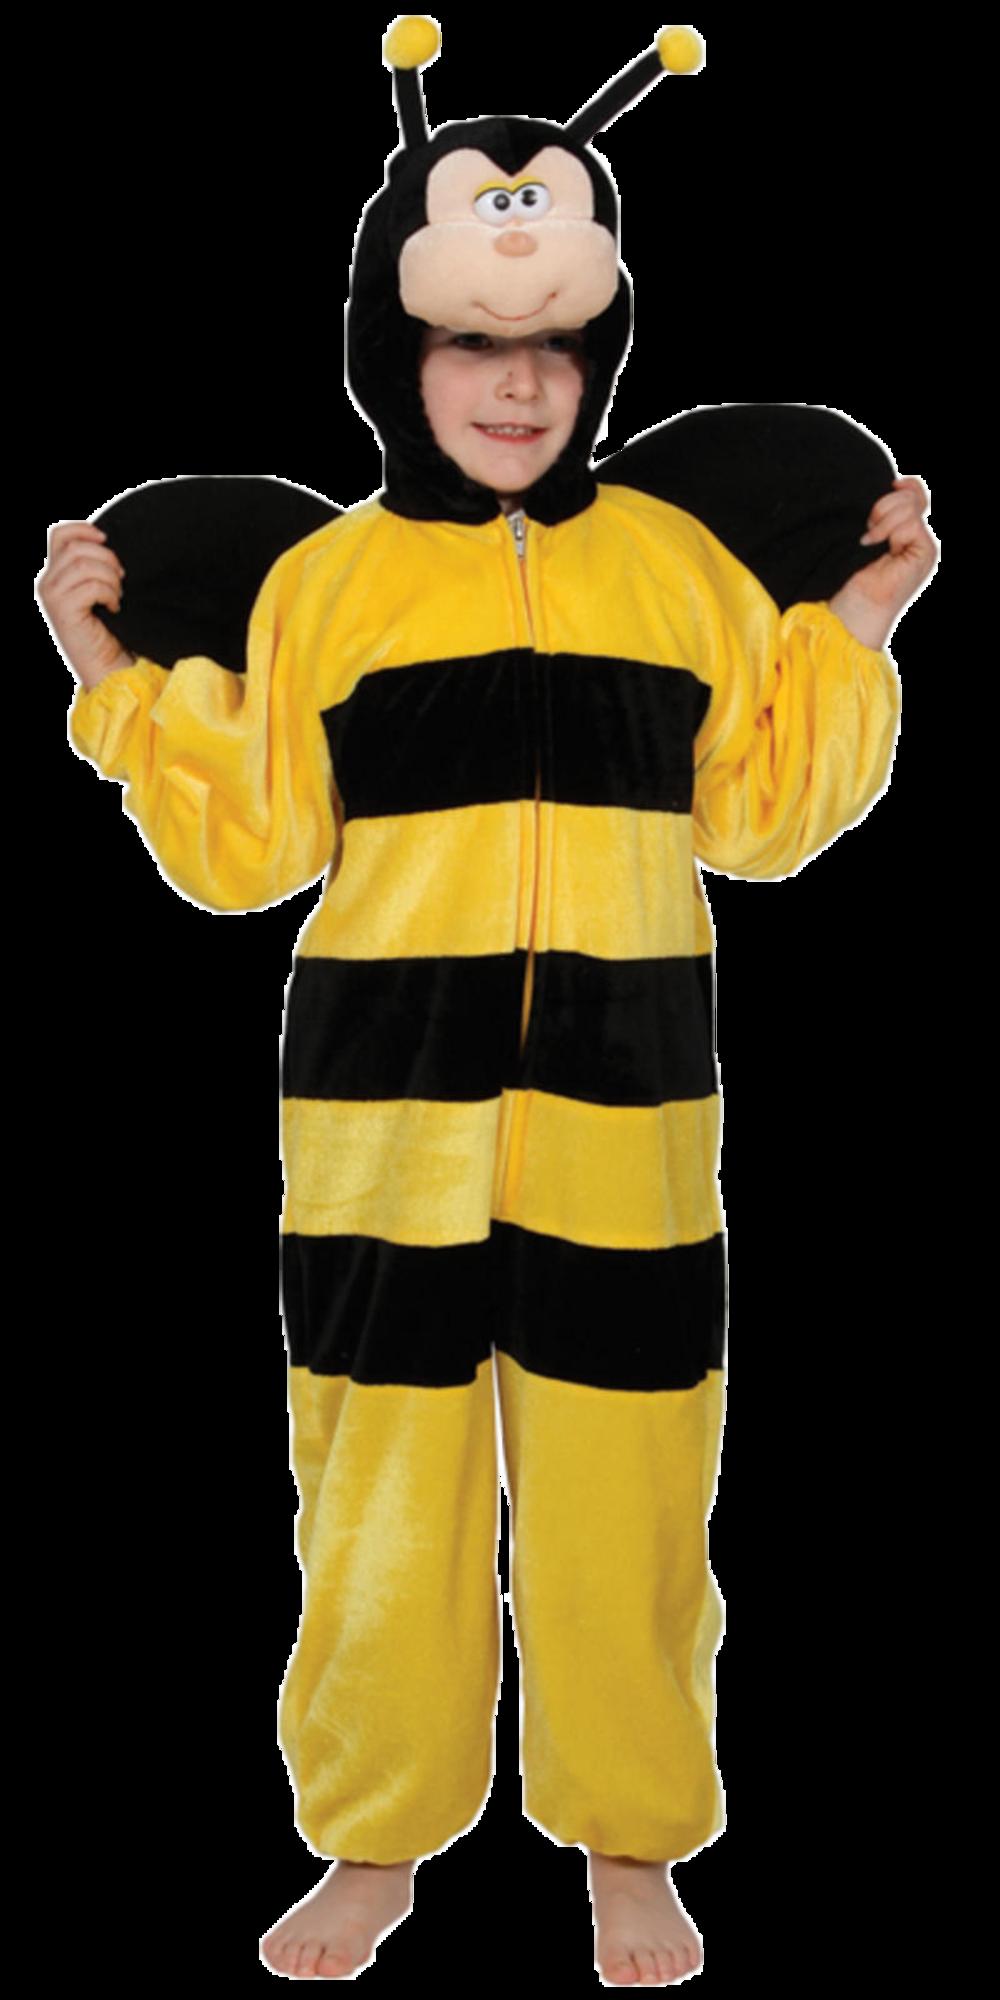 Kidu0027s Buzzing Bumble Bee Costume  sc 1 st  Mega Fancy Dress & Kidu0027s Buzzing Bumble Bee Costume | Letter